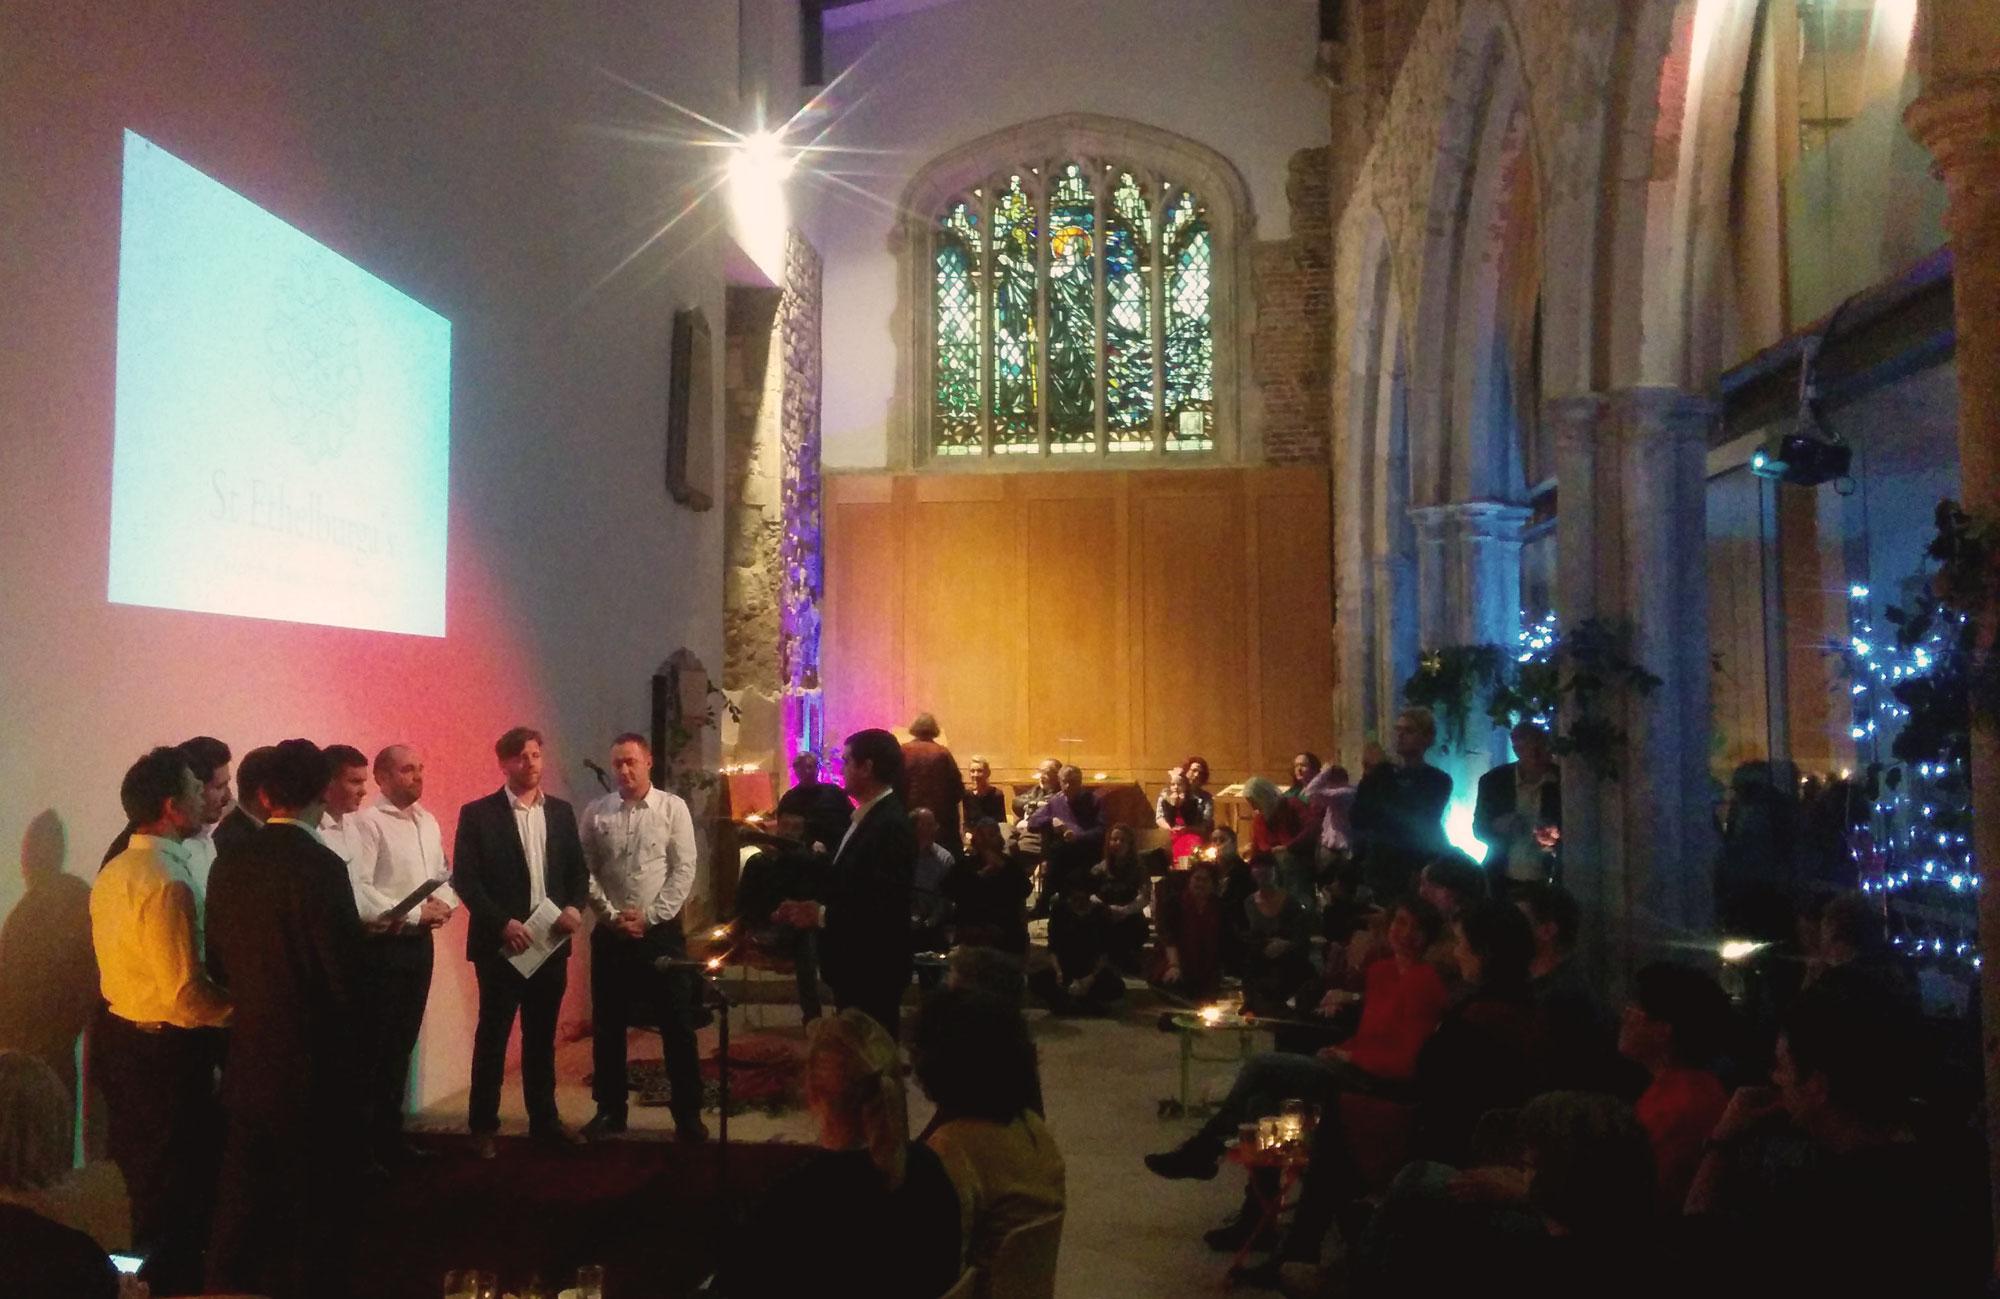 St Ethelburga's Christmas Party